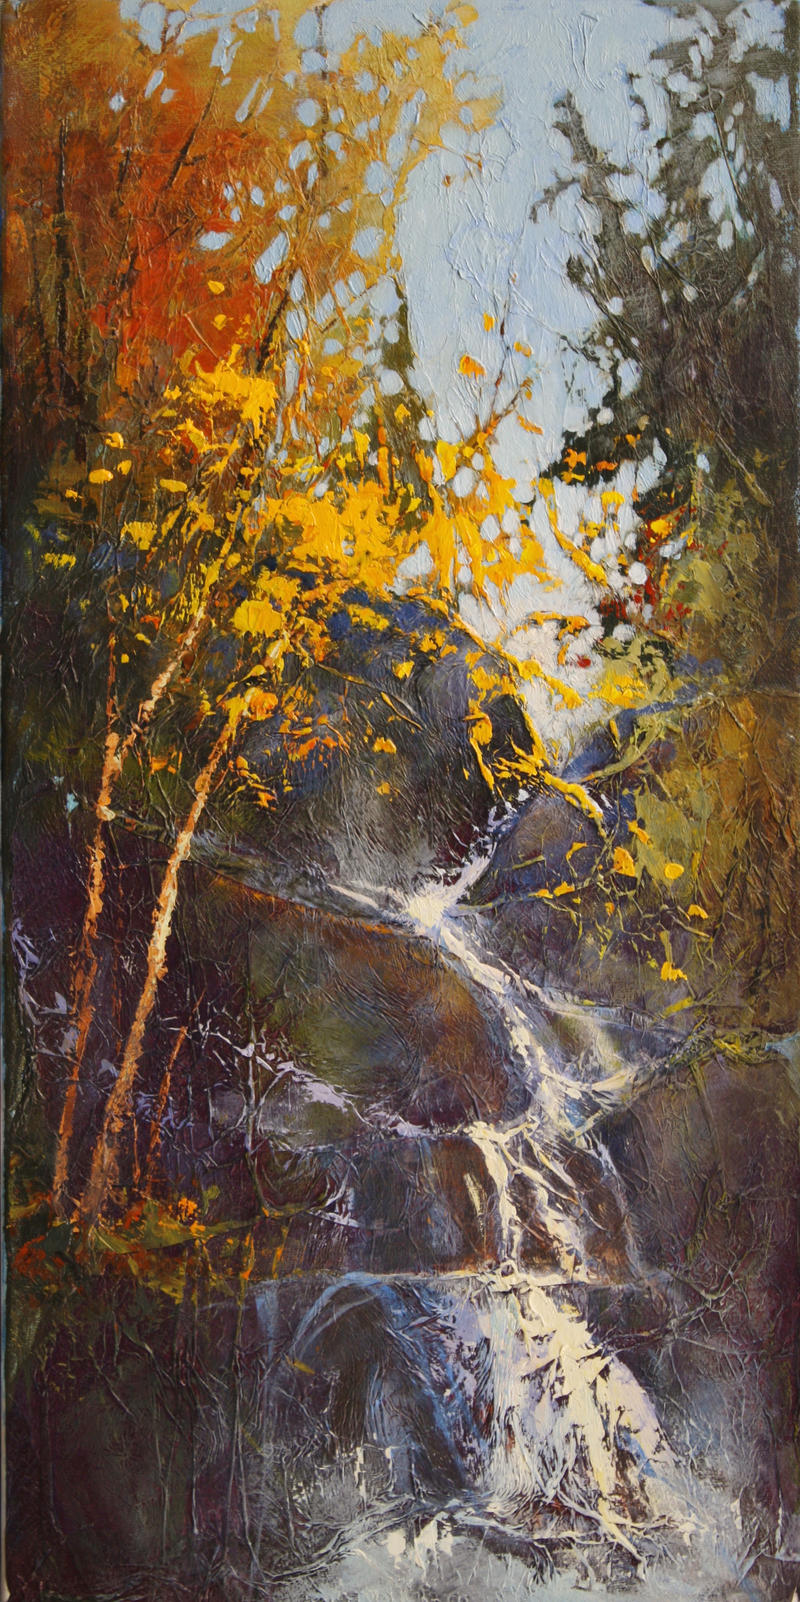 A Splash With Yellow by artistwilder